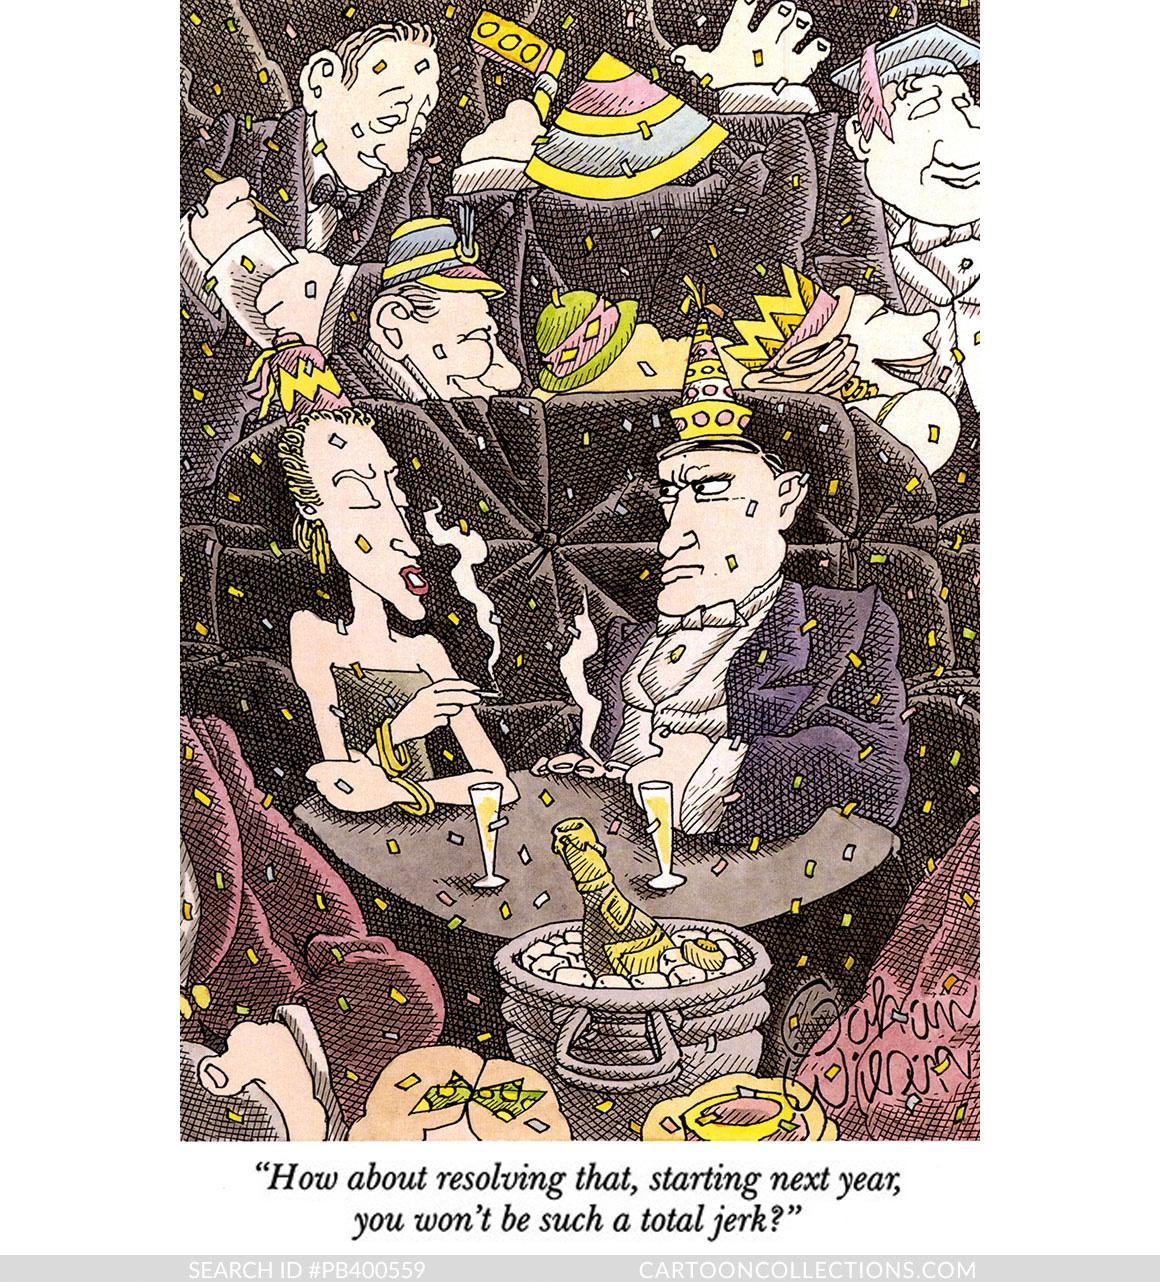 CartoonCollections.com - New Year's cartoons - Gahan Wilson